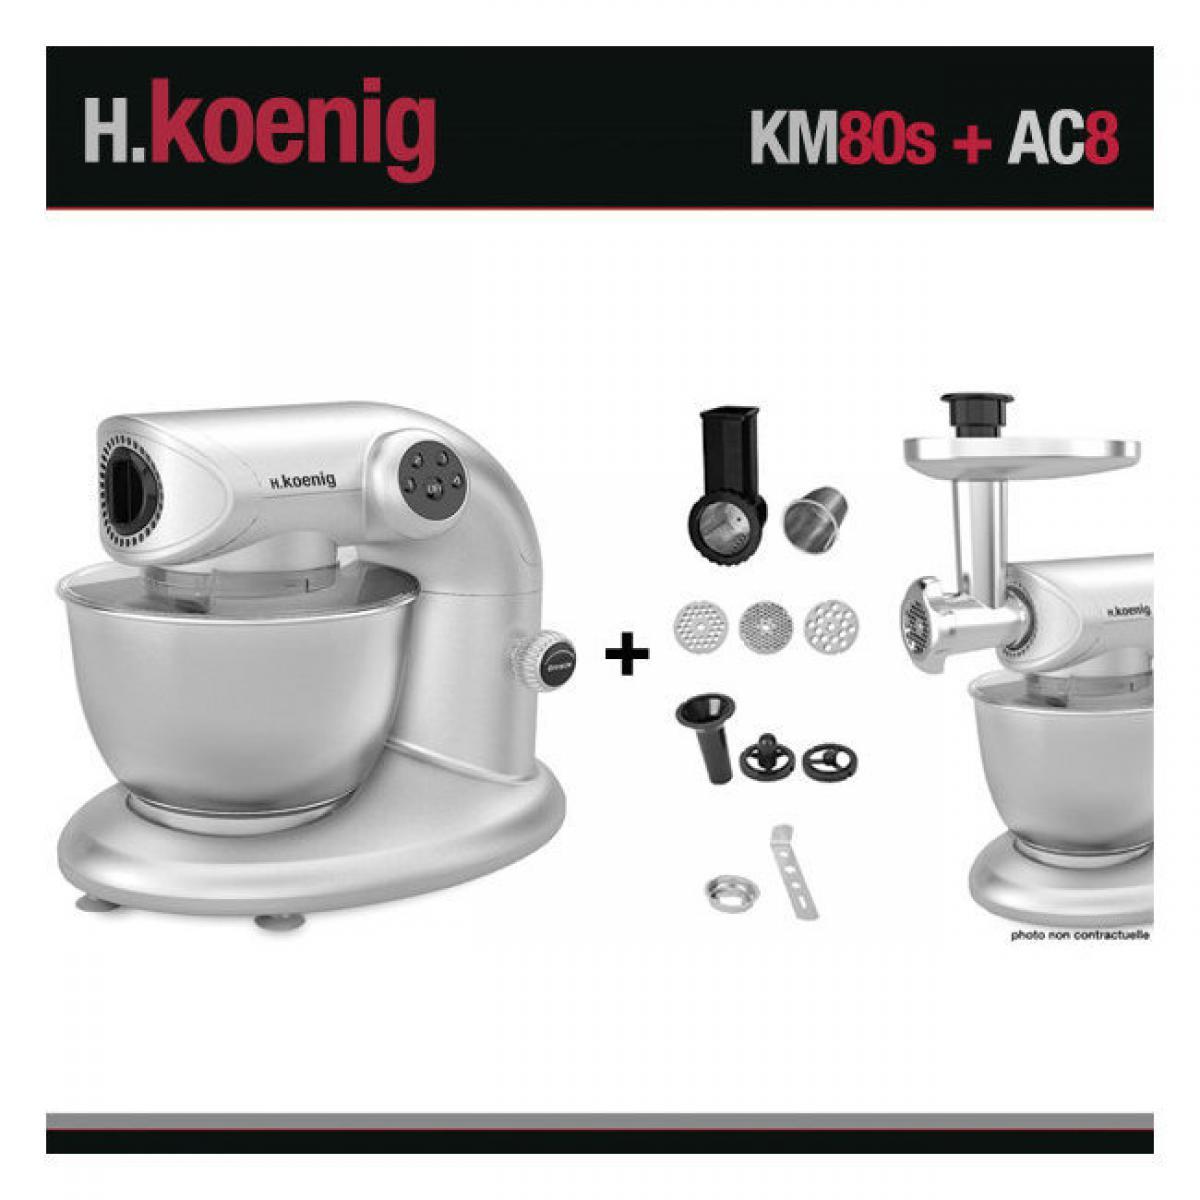 Hkoenig H.KOENIG KM80 S SILVER + AC8 : ROBOT PETRIN 1000W+ ACCESSOIRES OPTIONNELS